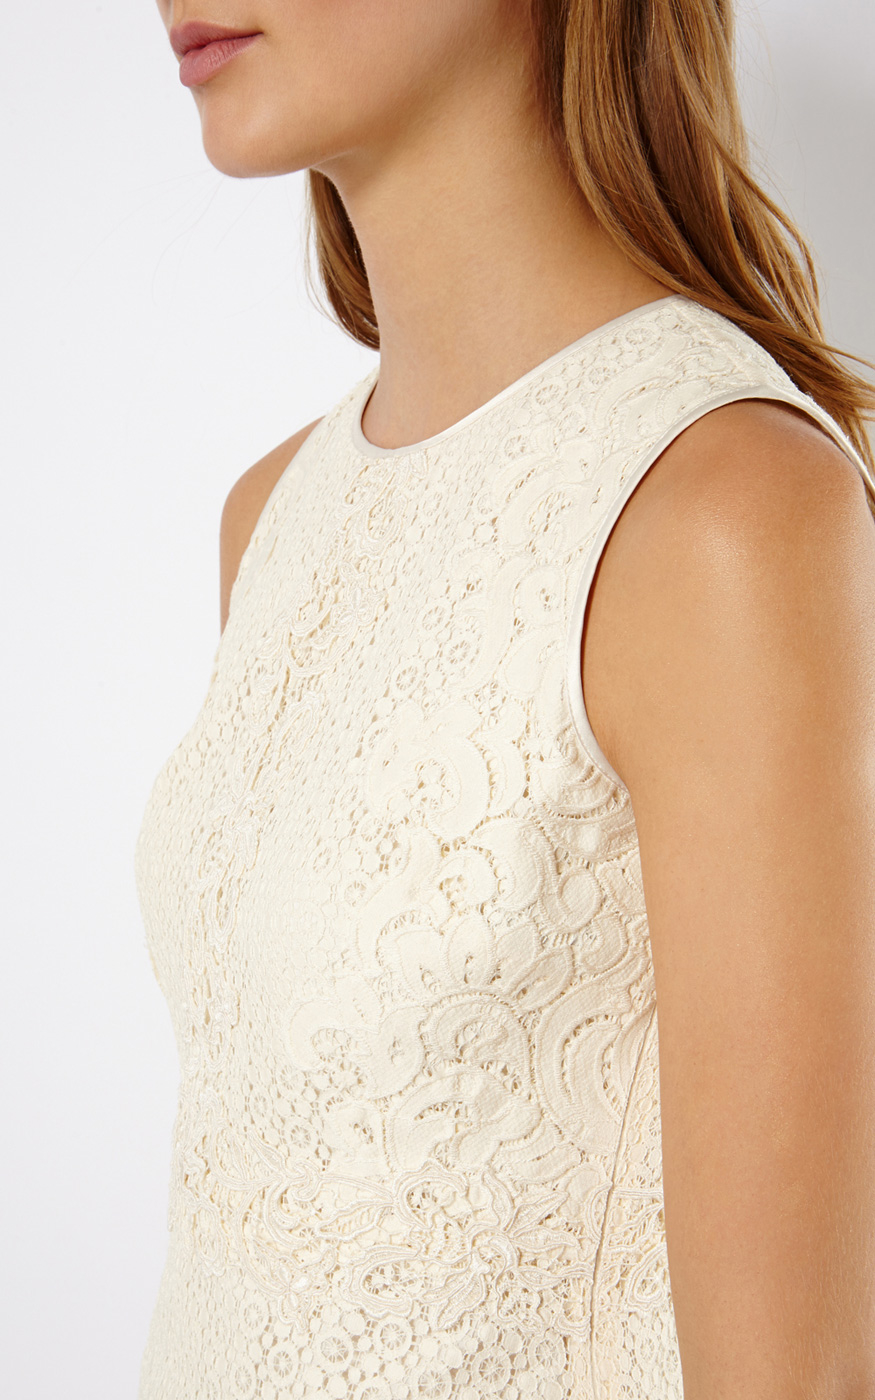 66e31e9fb3b923 Karen Millen Lace Top in White - Lyst